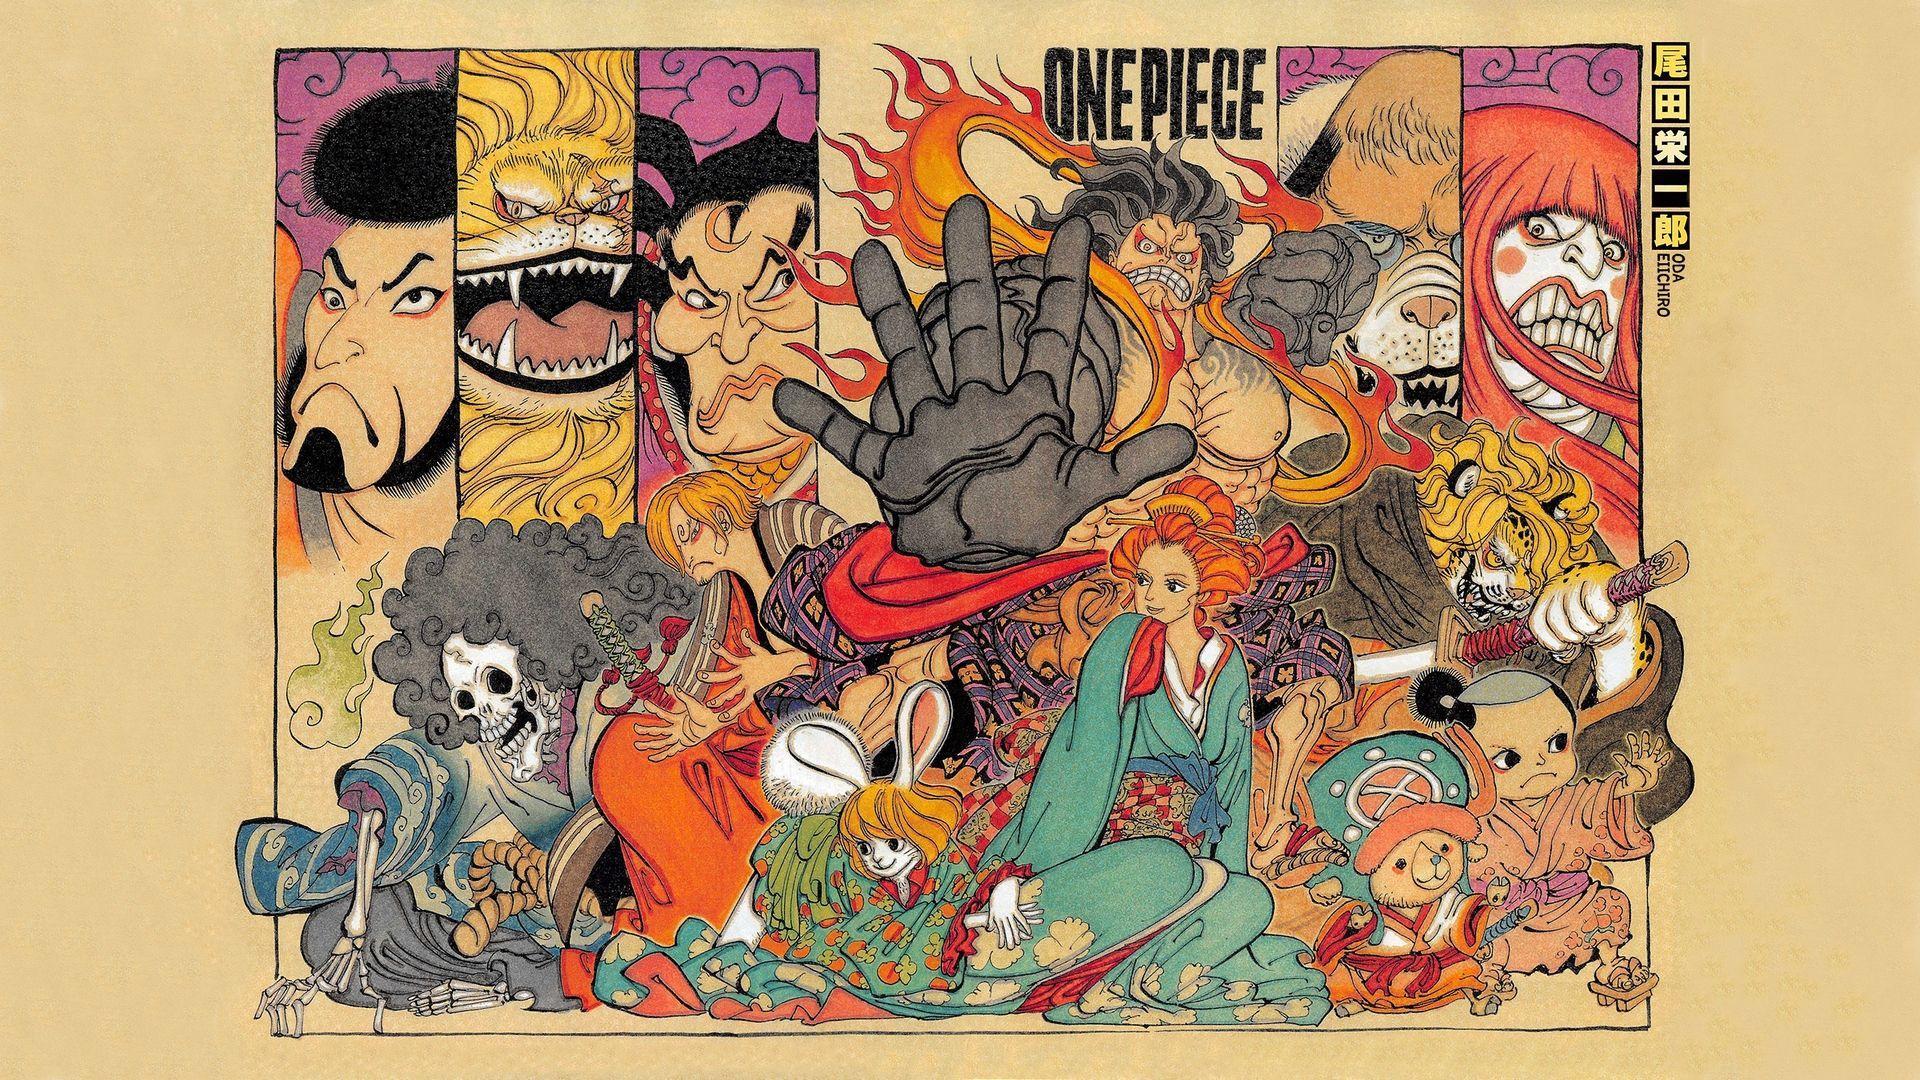 One Piece Manga Wallpapers Top Free One Piece Manga Backgrounds